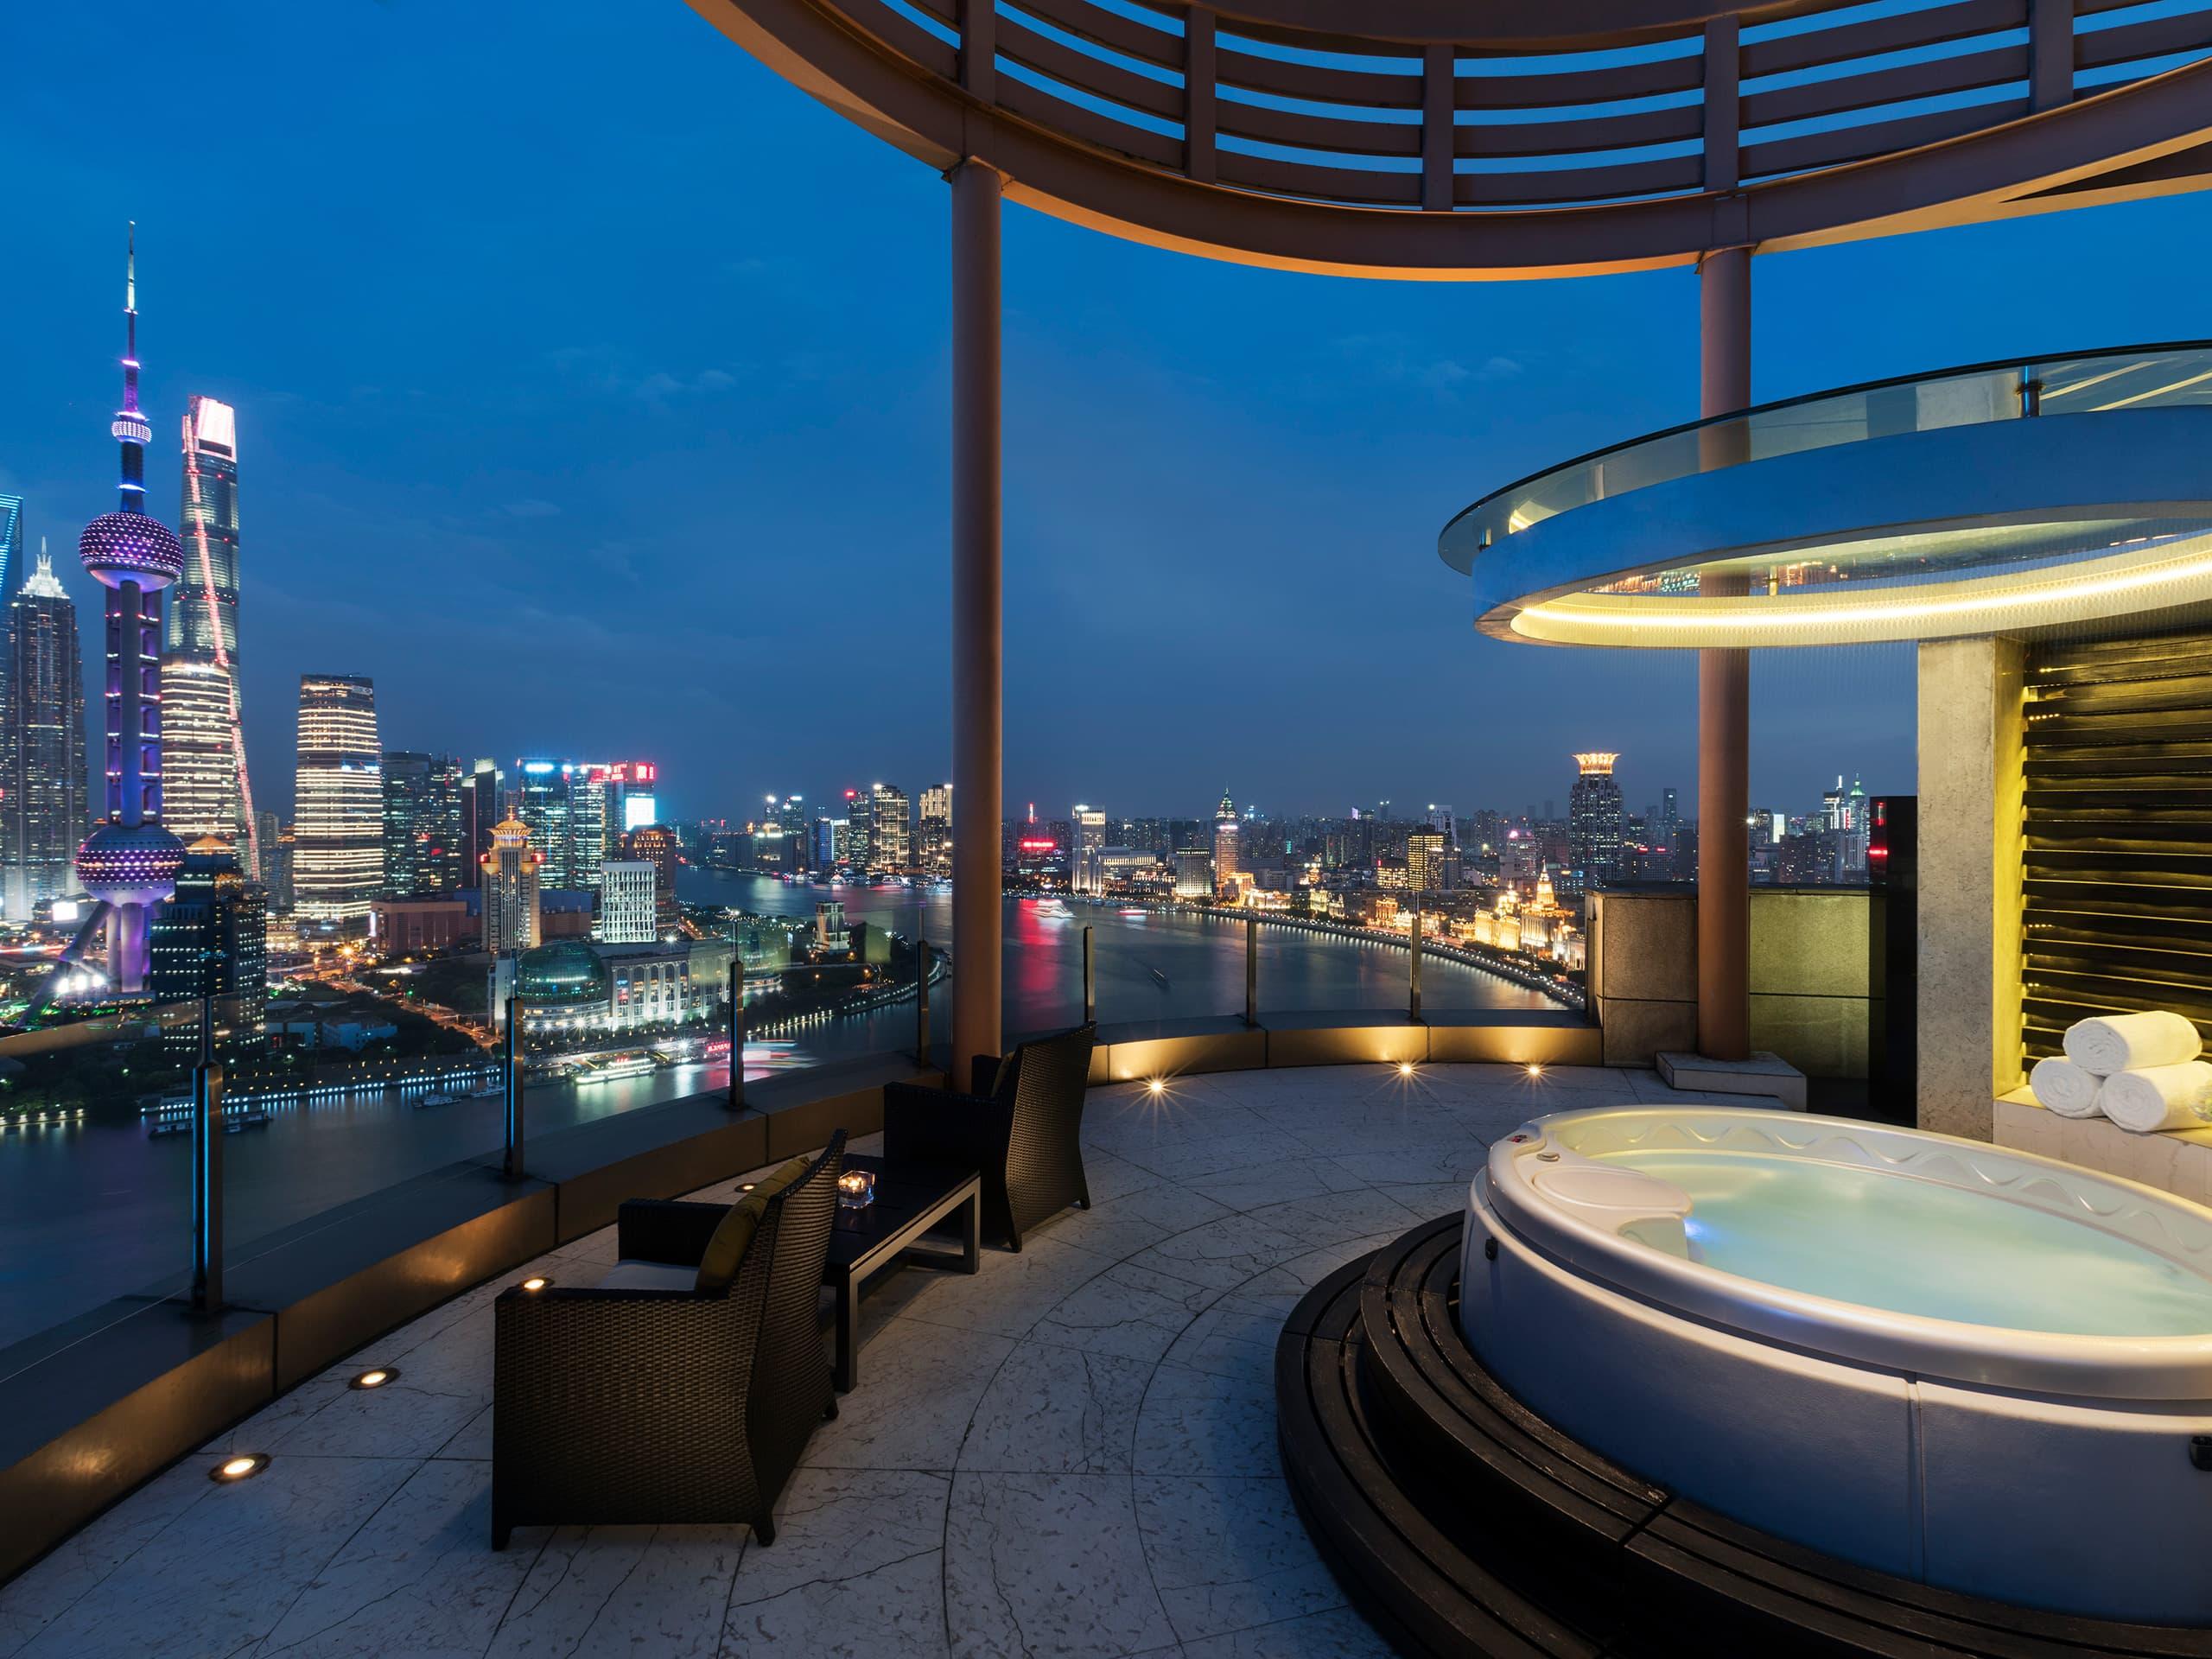 luxury 5 star hotels in shanghai china丨hyatt on the bund丨hyatt